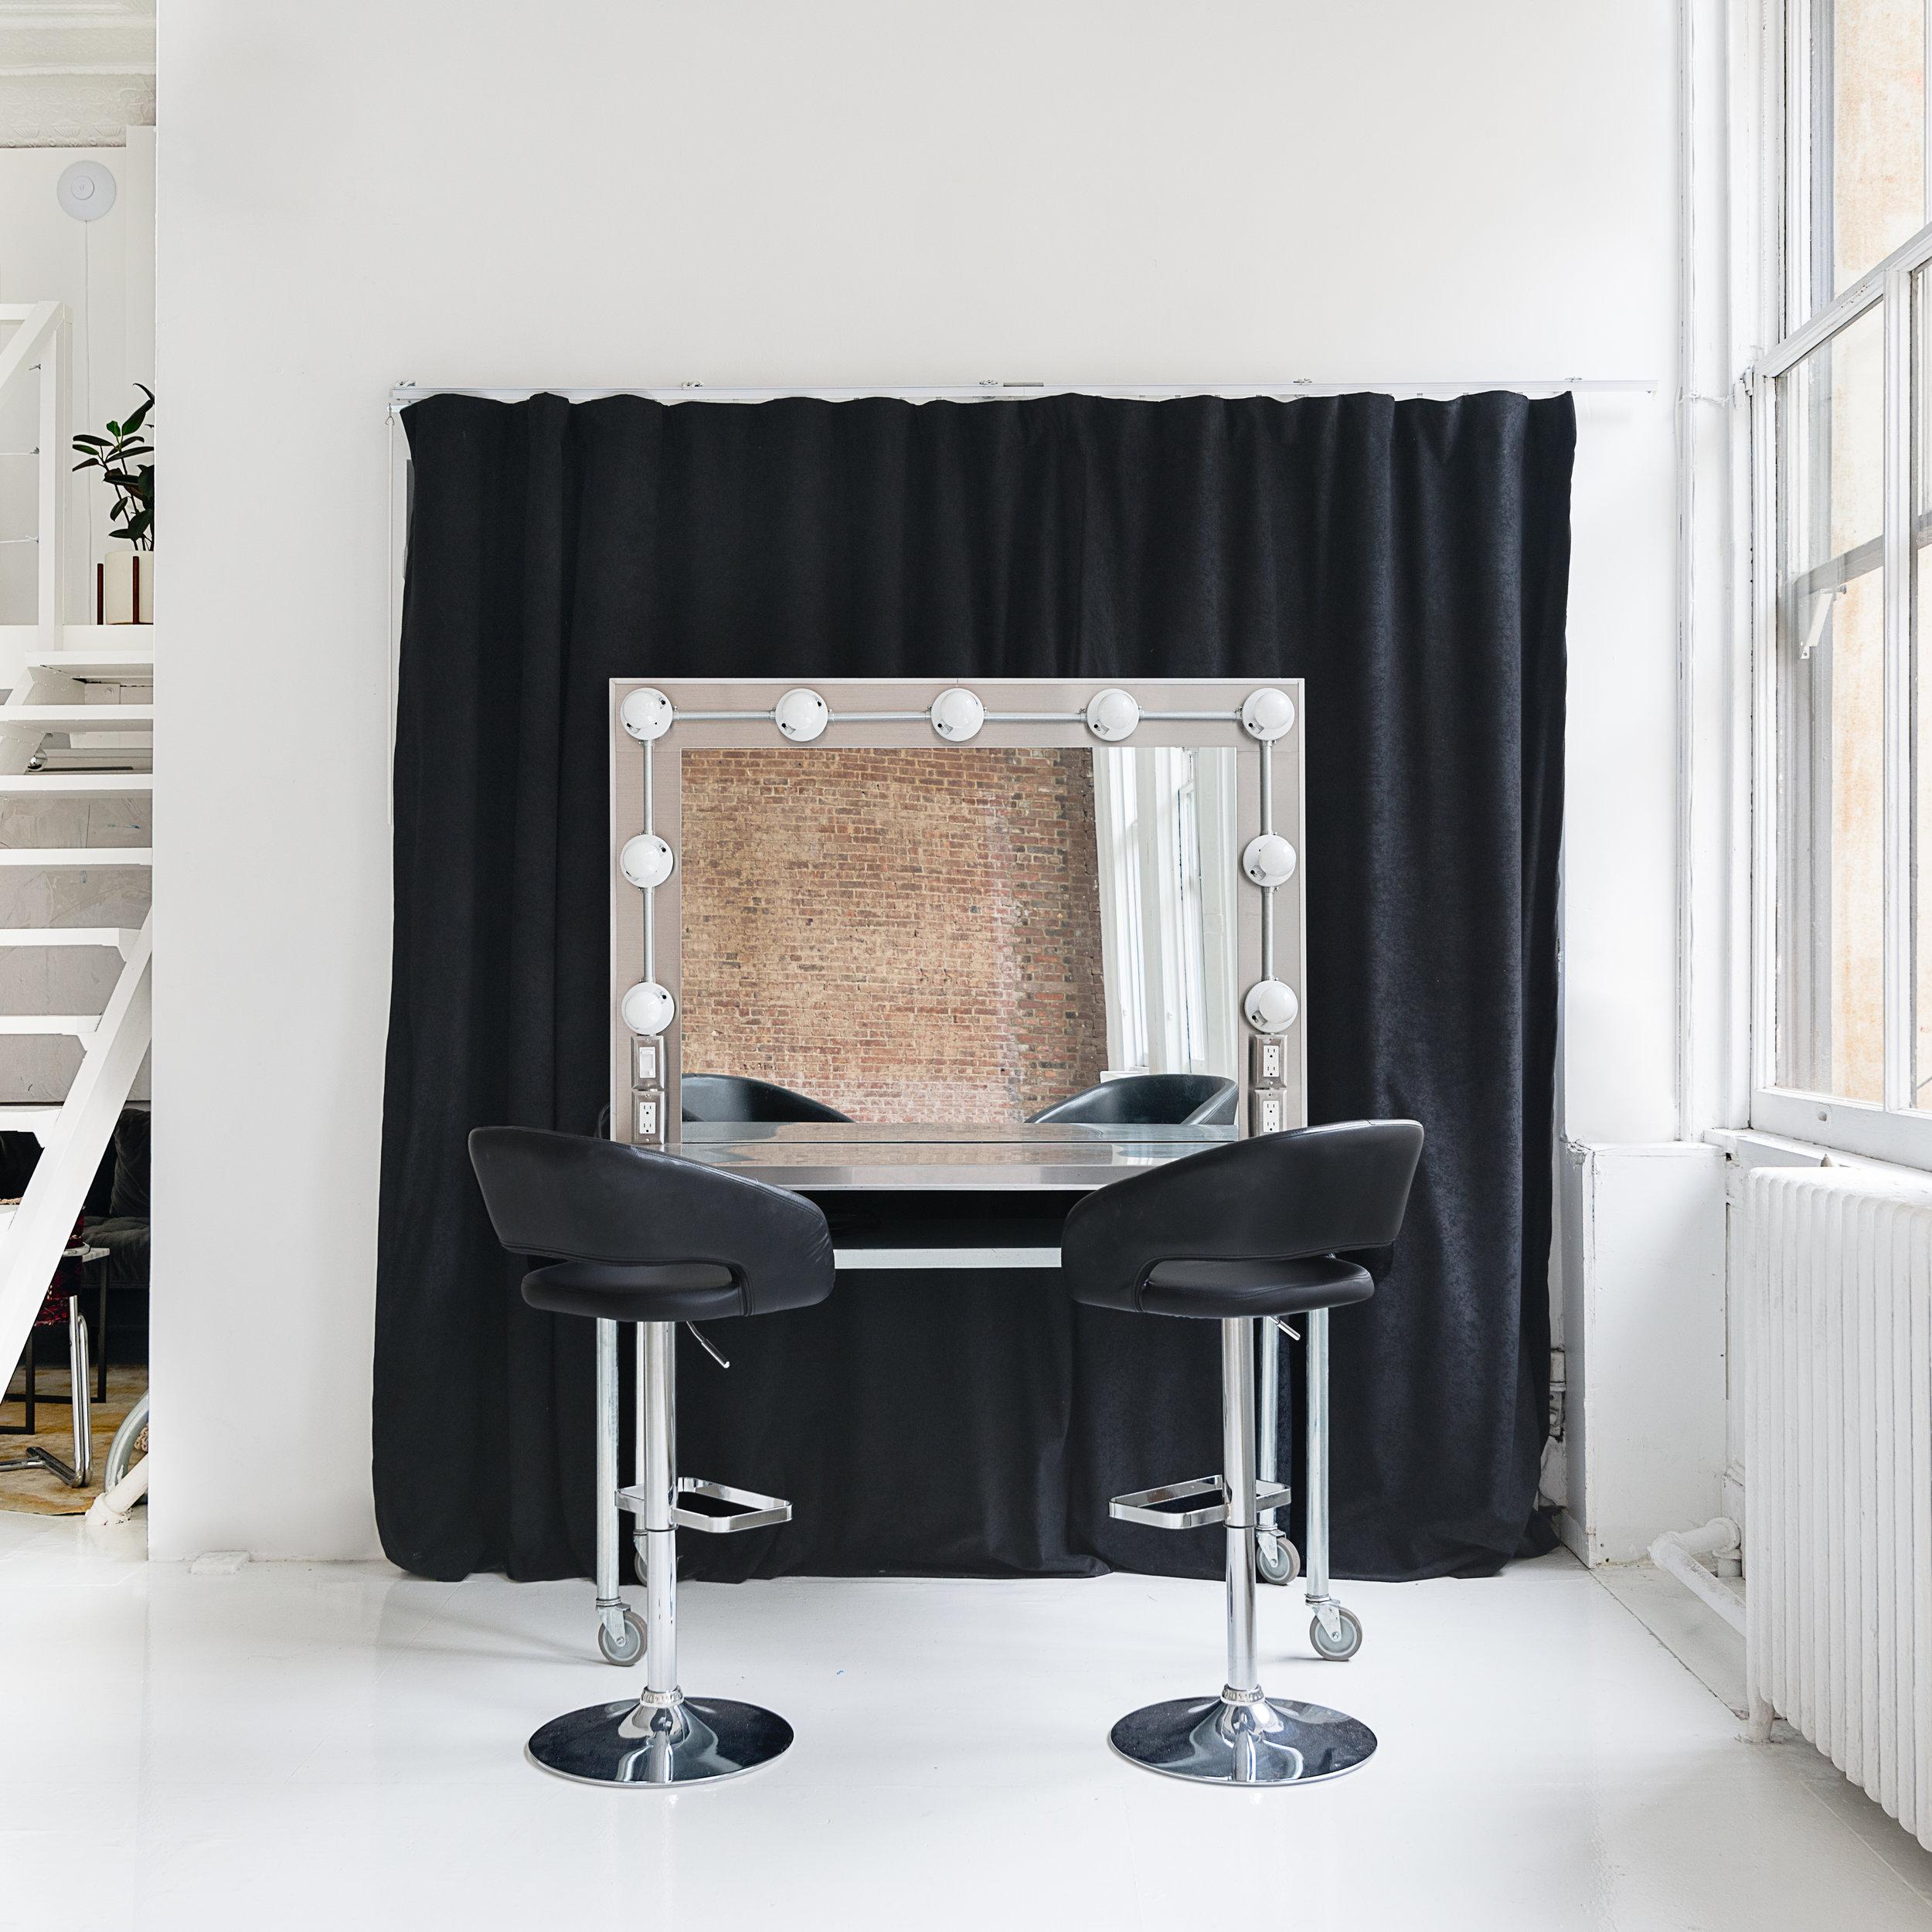 457 Broome Street Unit 2F - Blank Studio-1.jpg